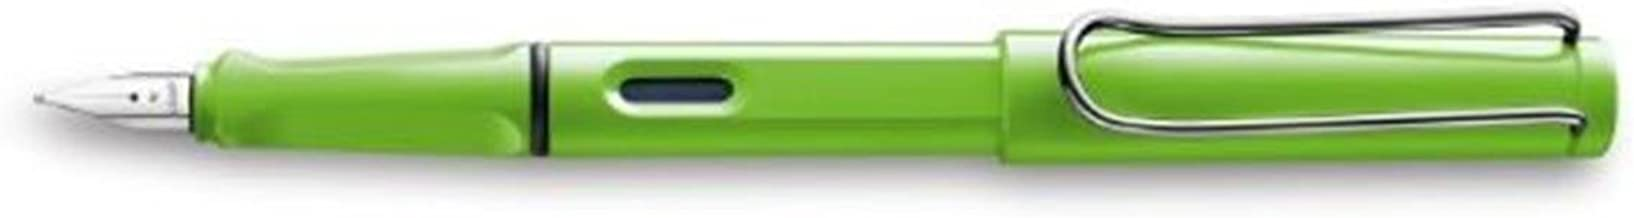 Lamy 1230636 Safari Fountain Pen Left Handed LH Green